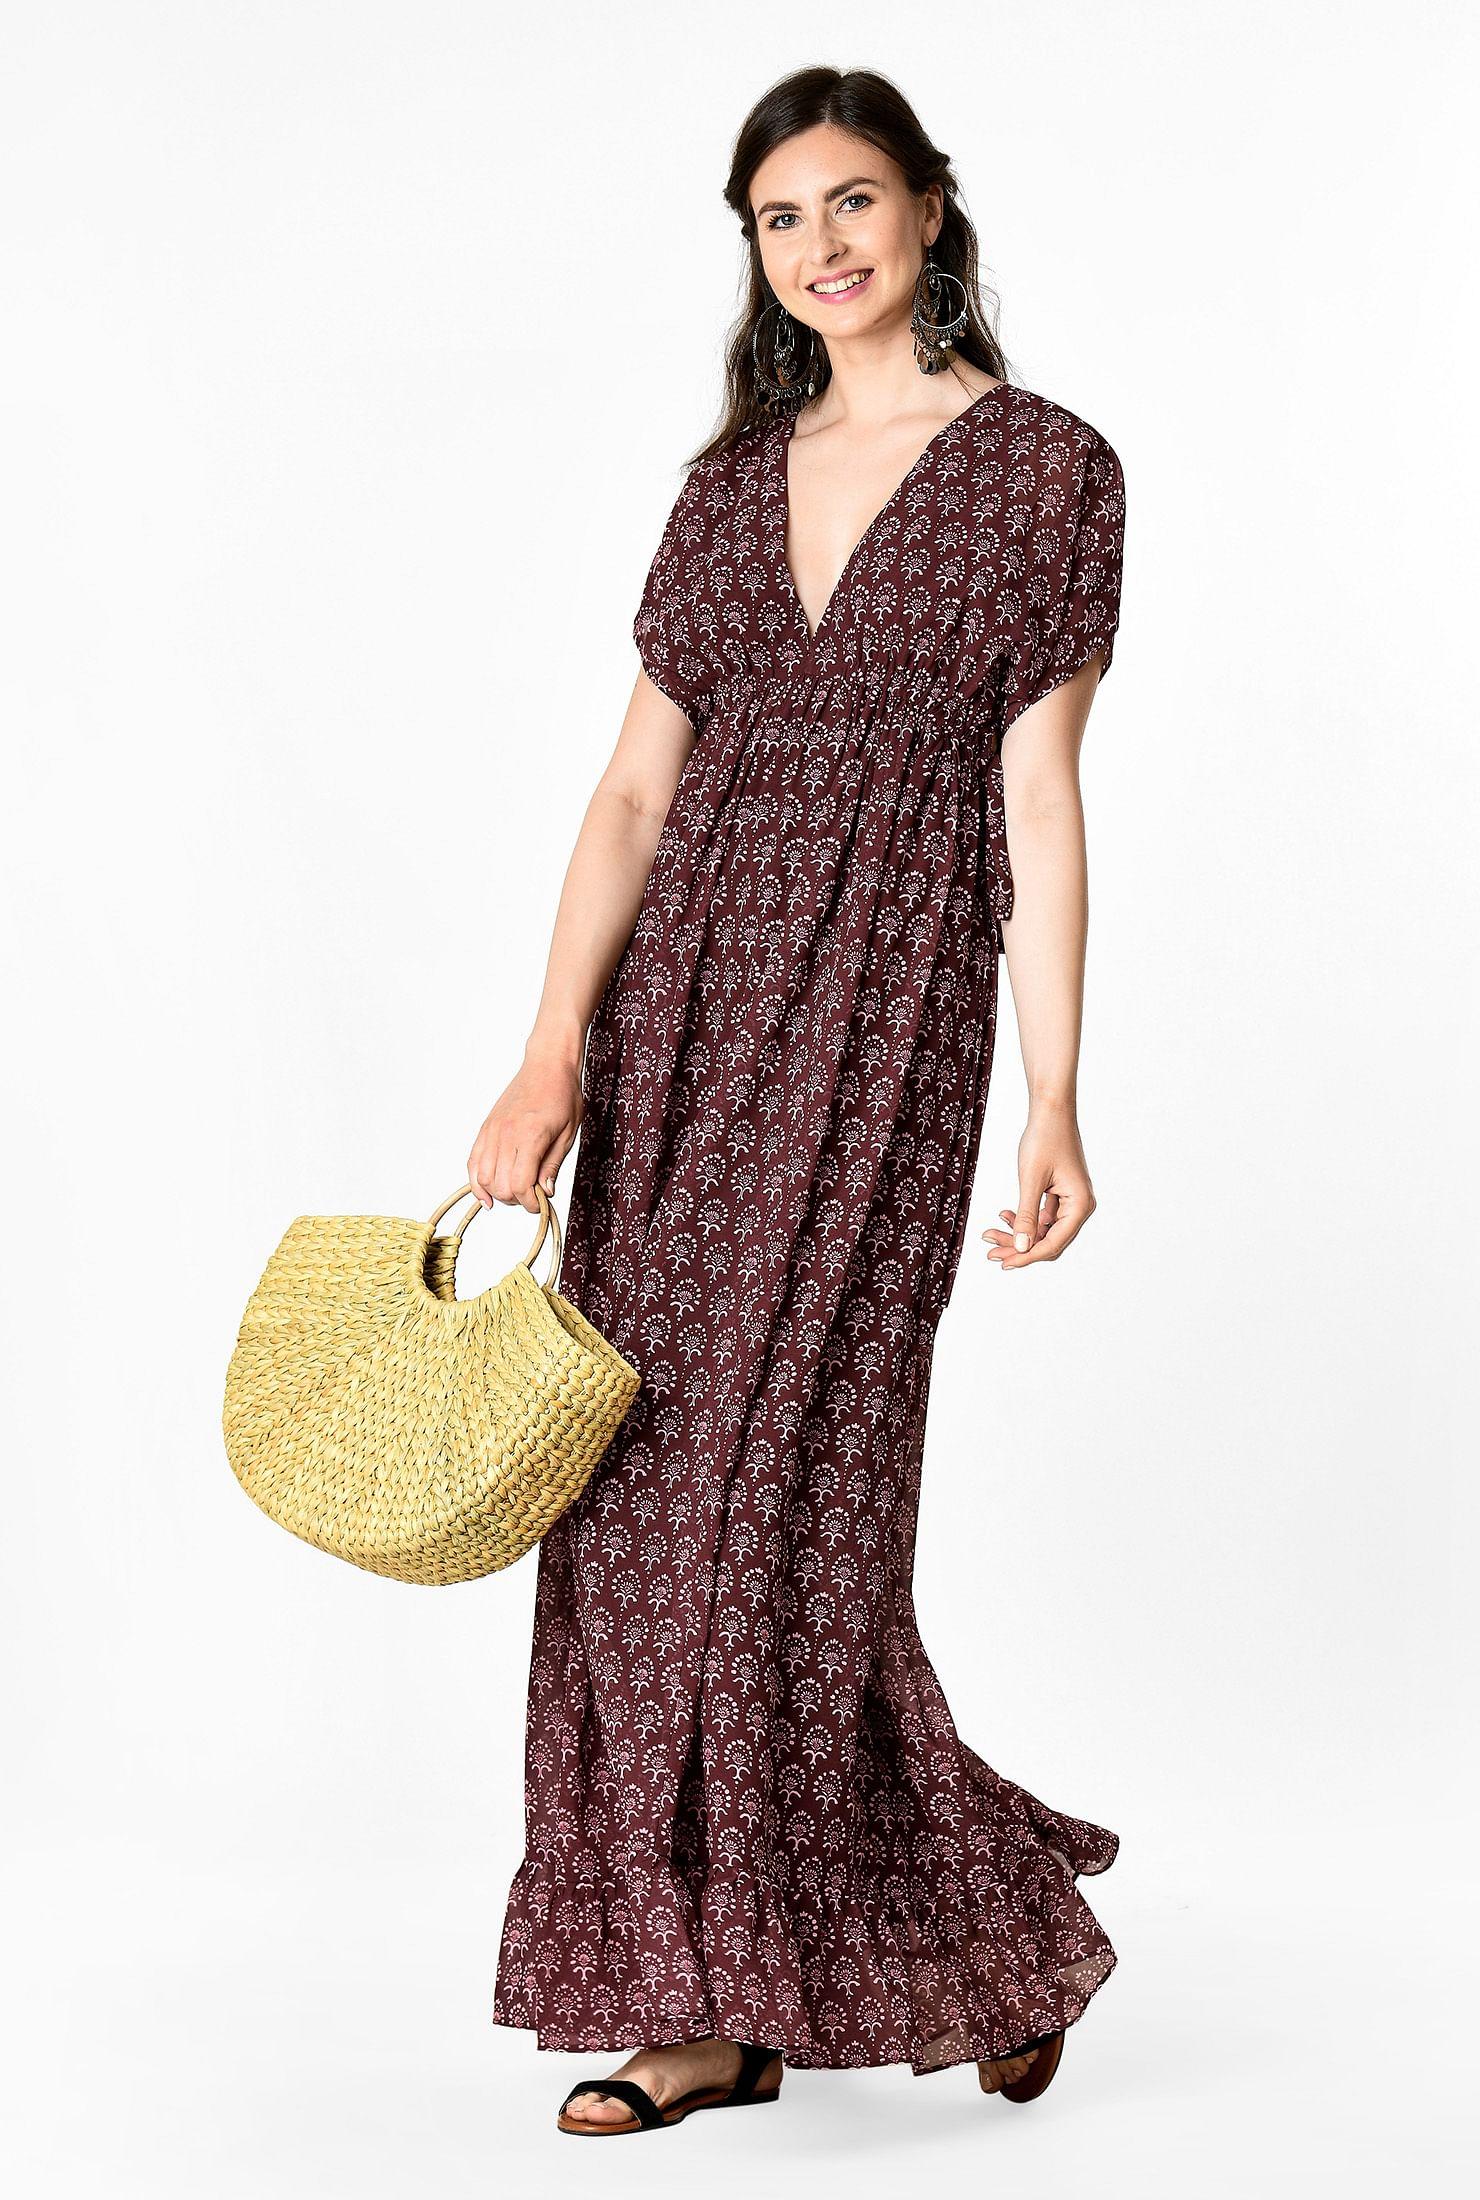 f9c1228985e43 ... drawstring empire maxi dress. , all-size inclusive dresses, casual  event dresses, petites, plus size dresses